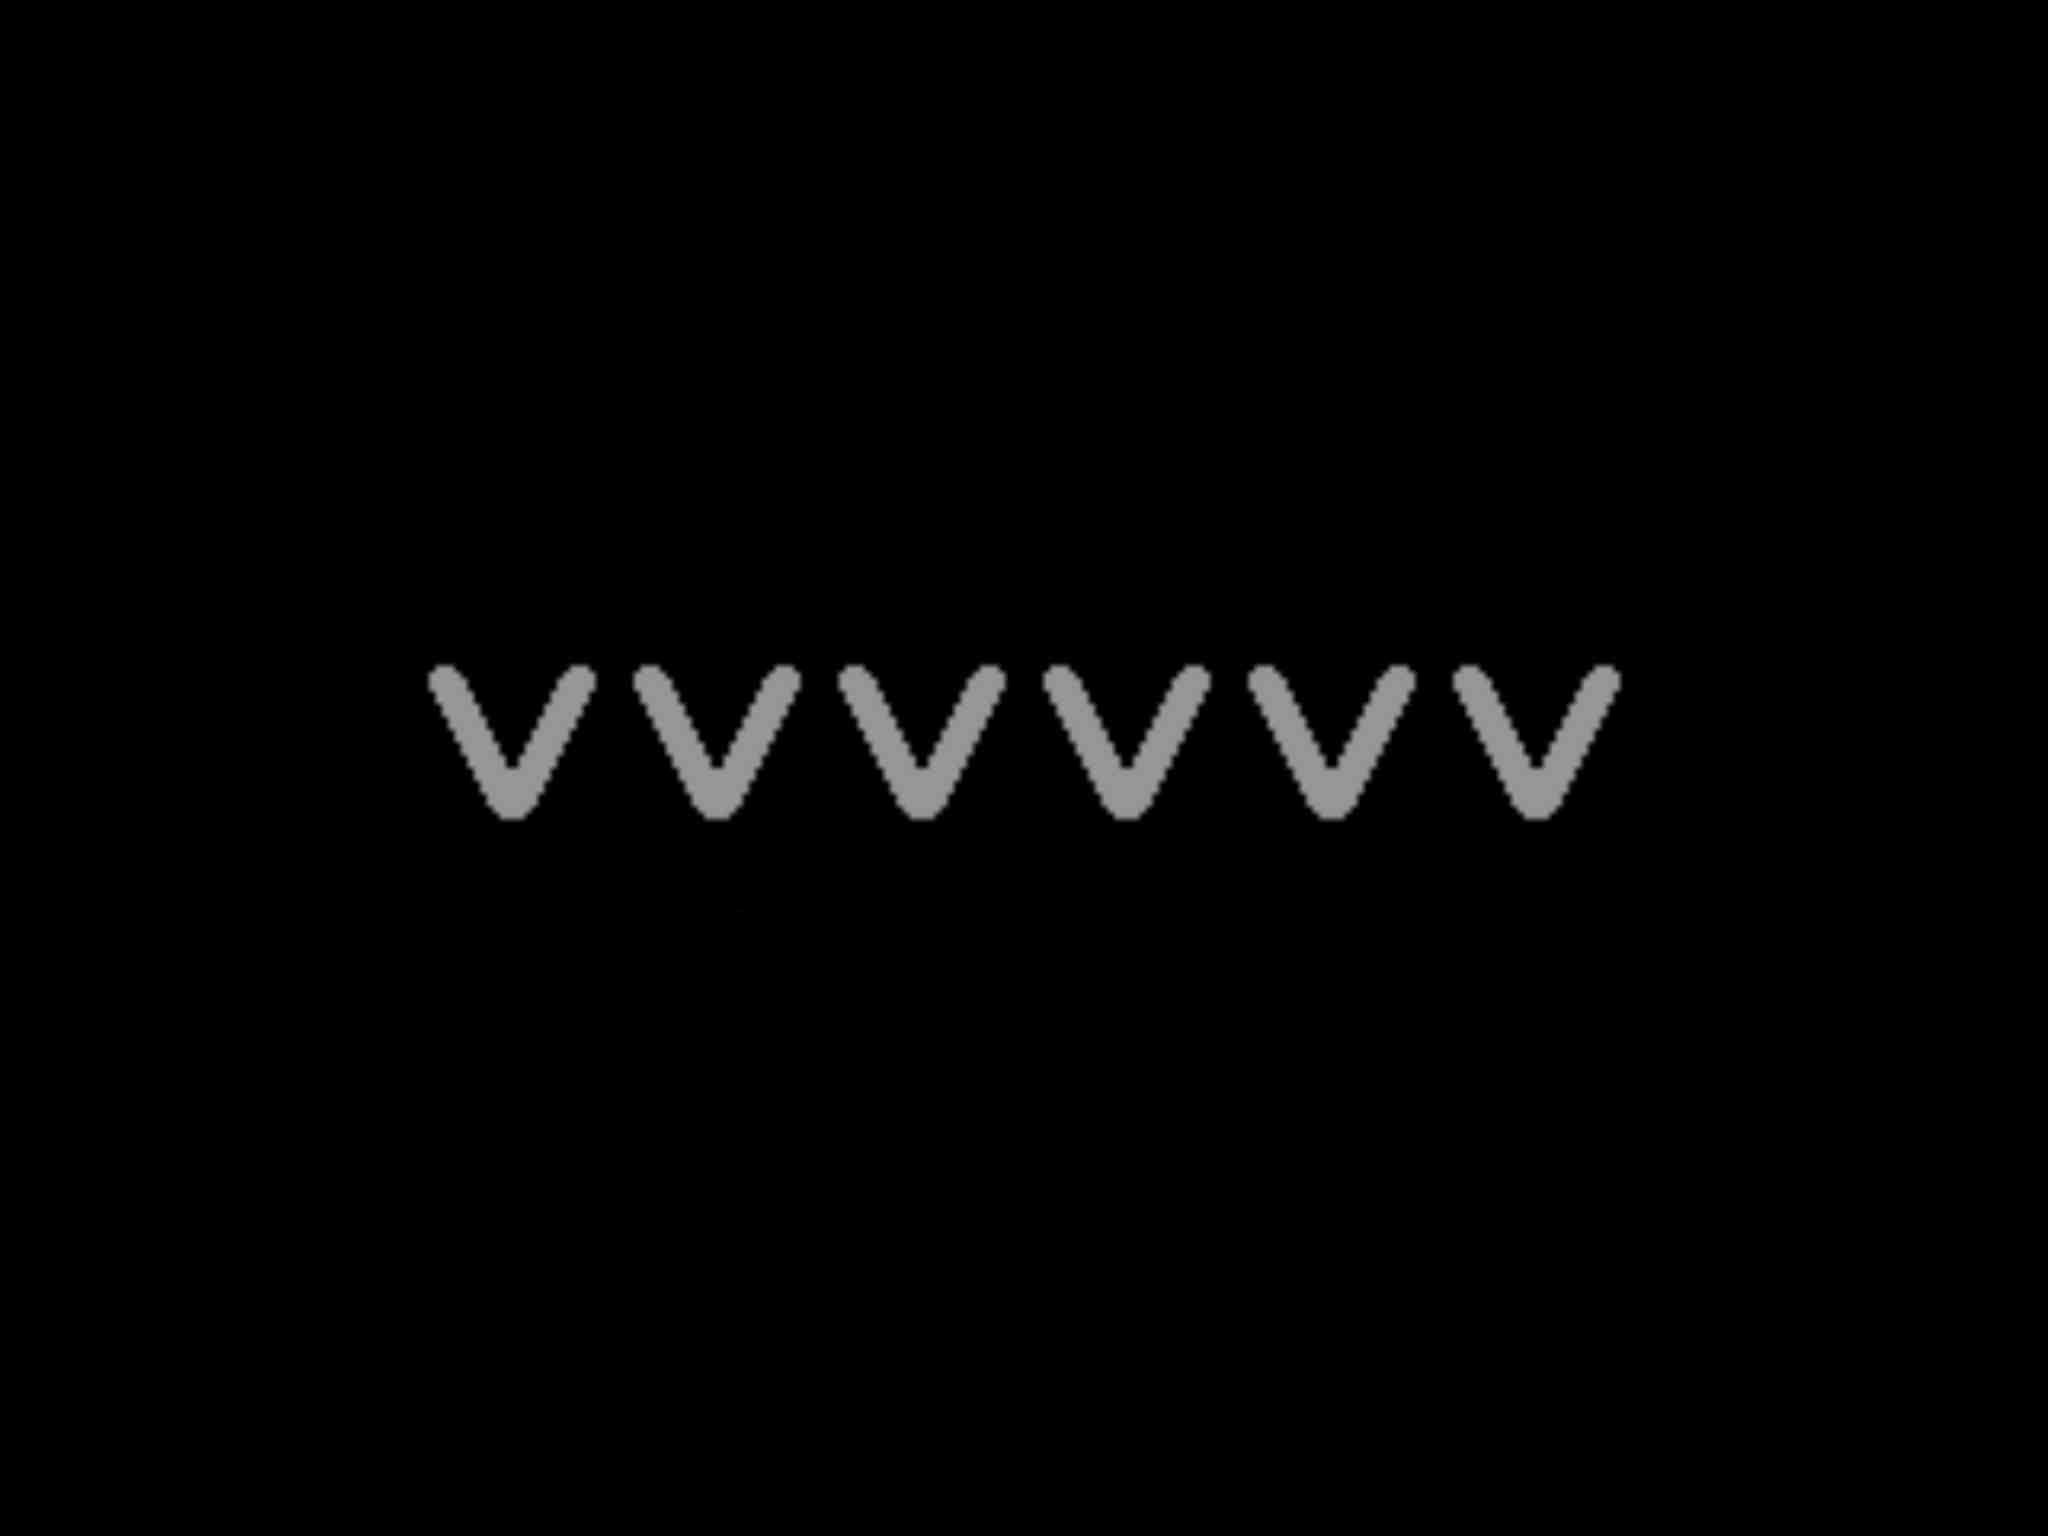 VVVVVV_01A